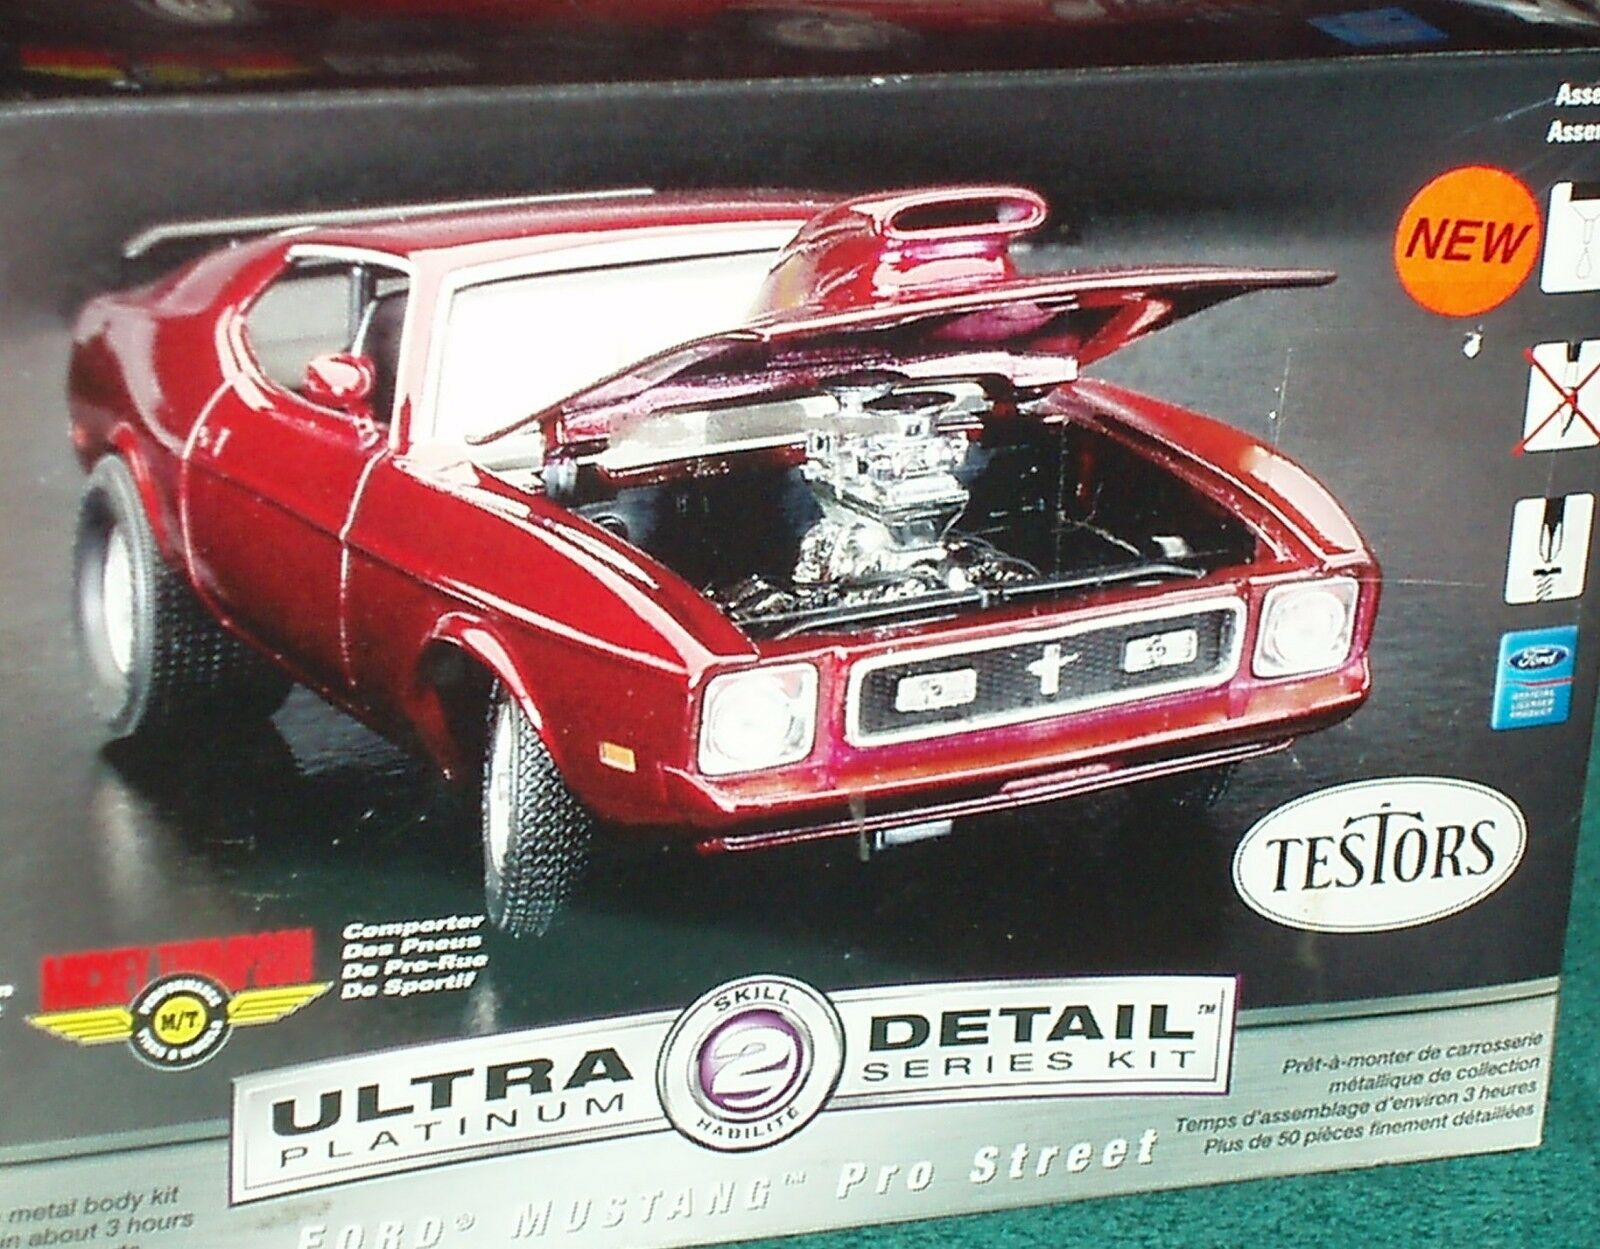 Testor's 1971 Ford Mustang Mach 1 Pro Street Modelo Kit de Sellado de habilidades 1 24 2